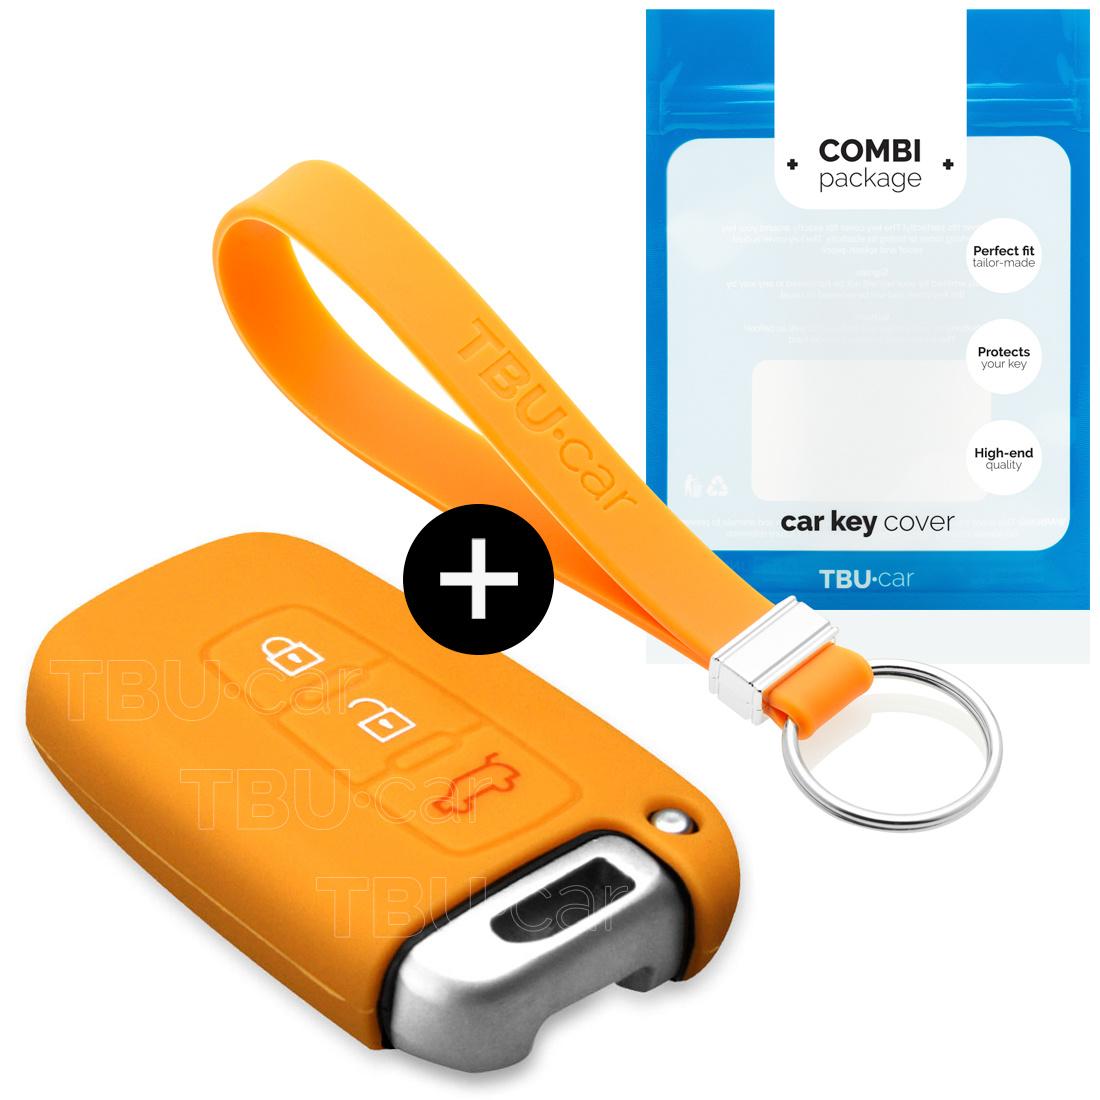 Hyundai Car key cover - Silicone Protective Remote Key Shell - FOB Case Cover - Orange